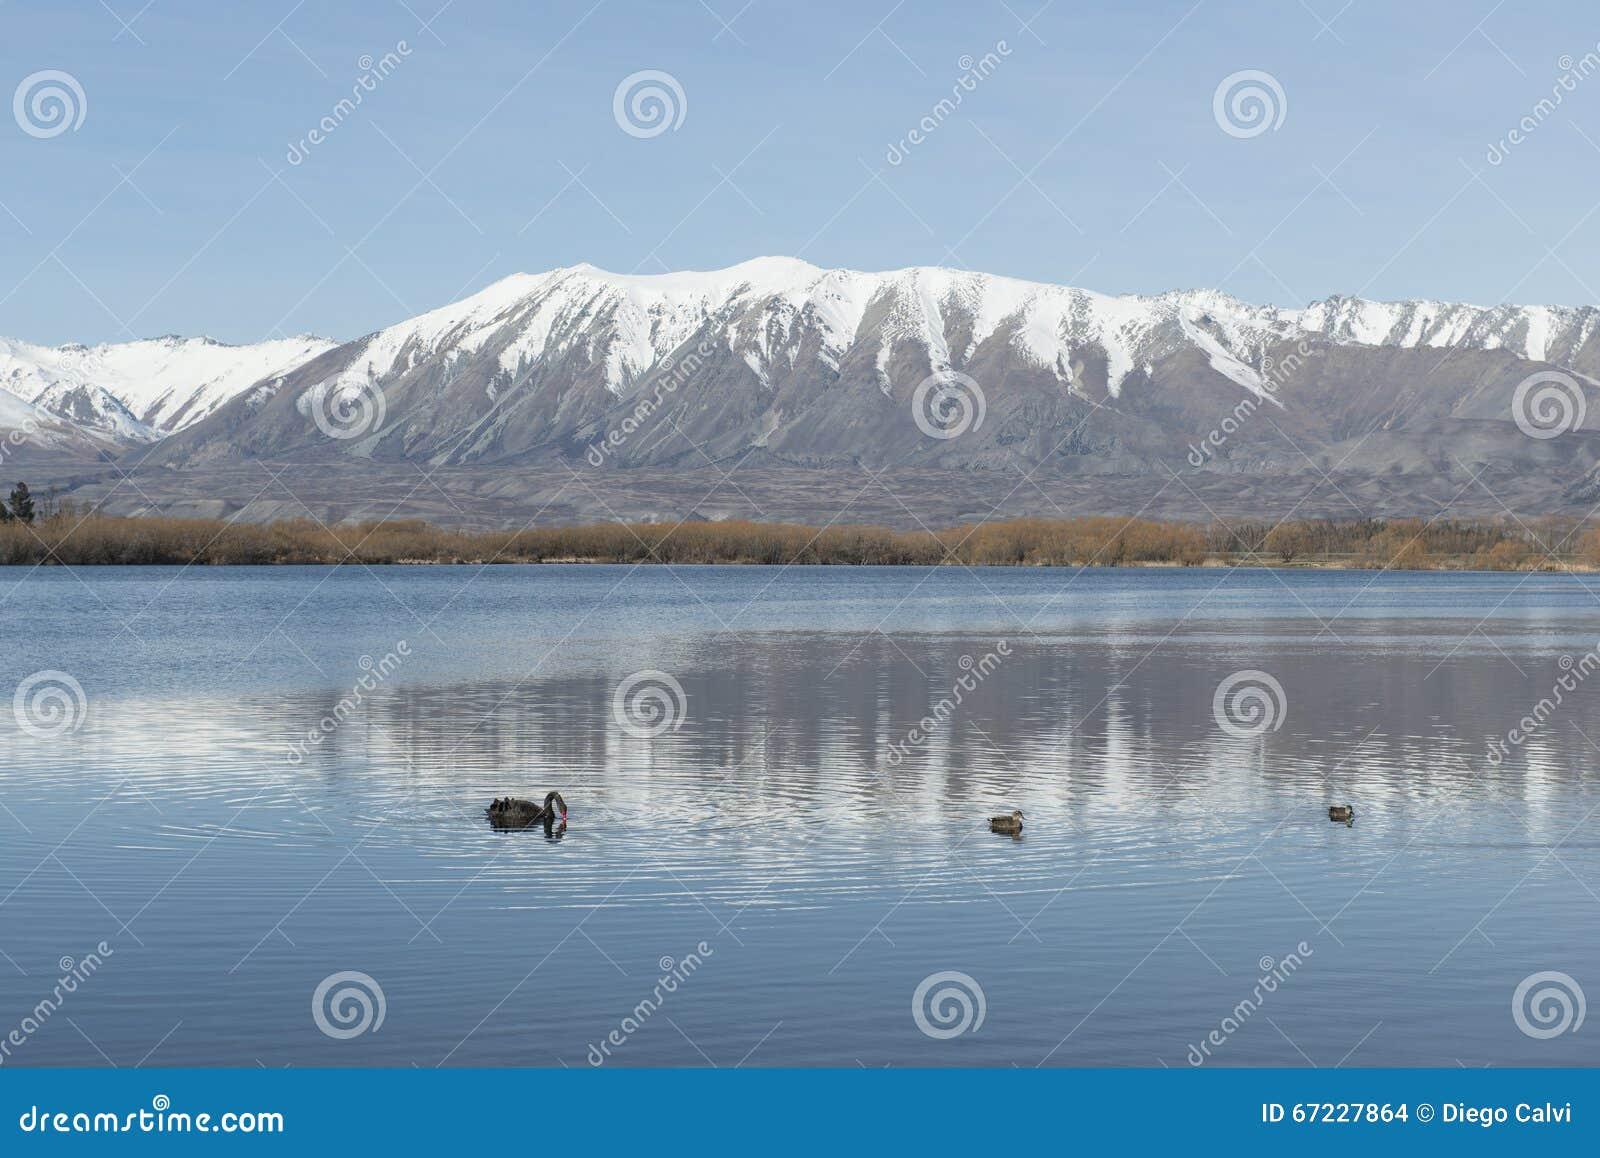 Canoe New Zealand South Island